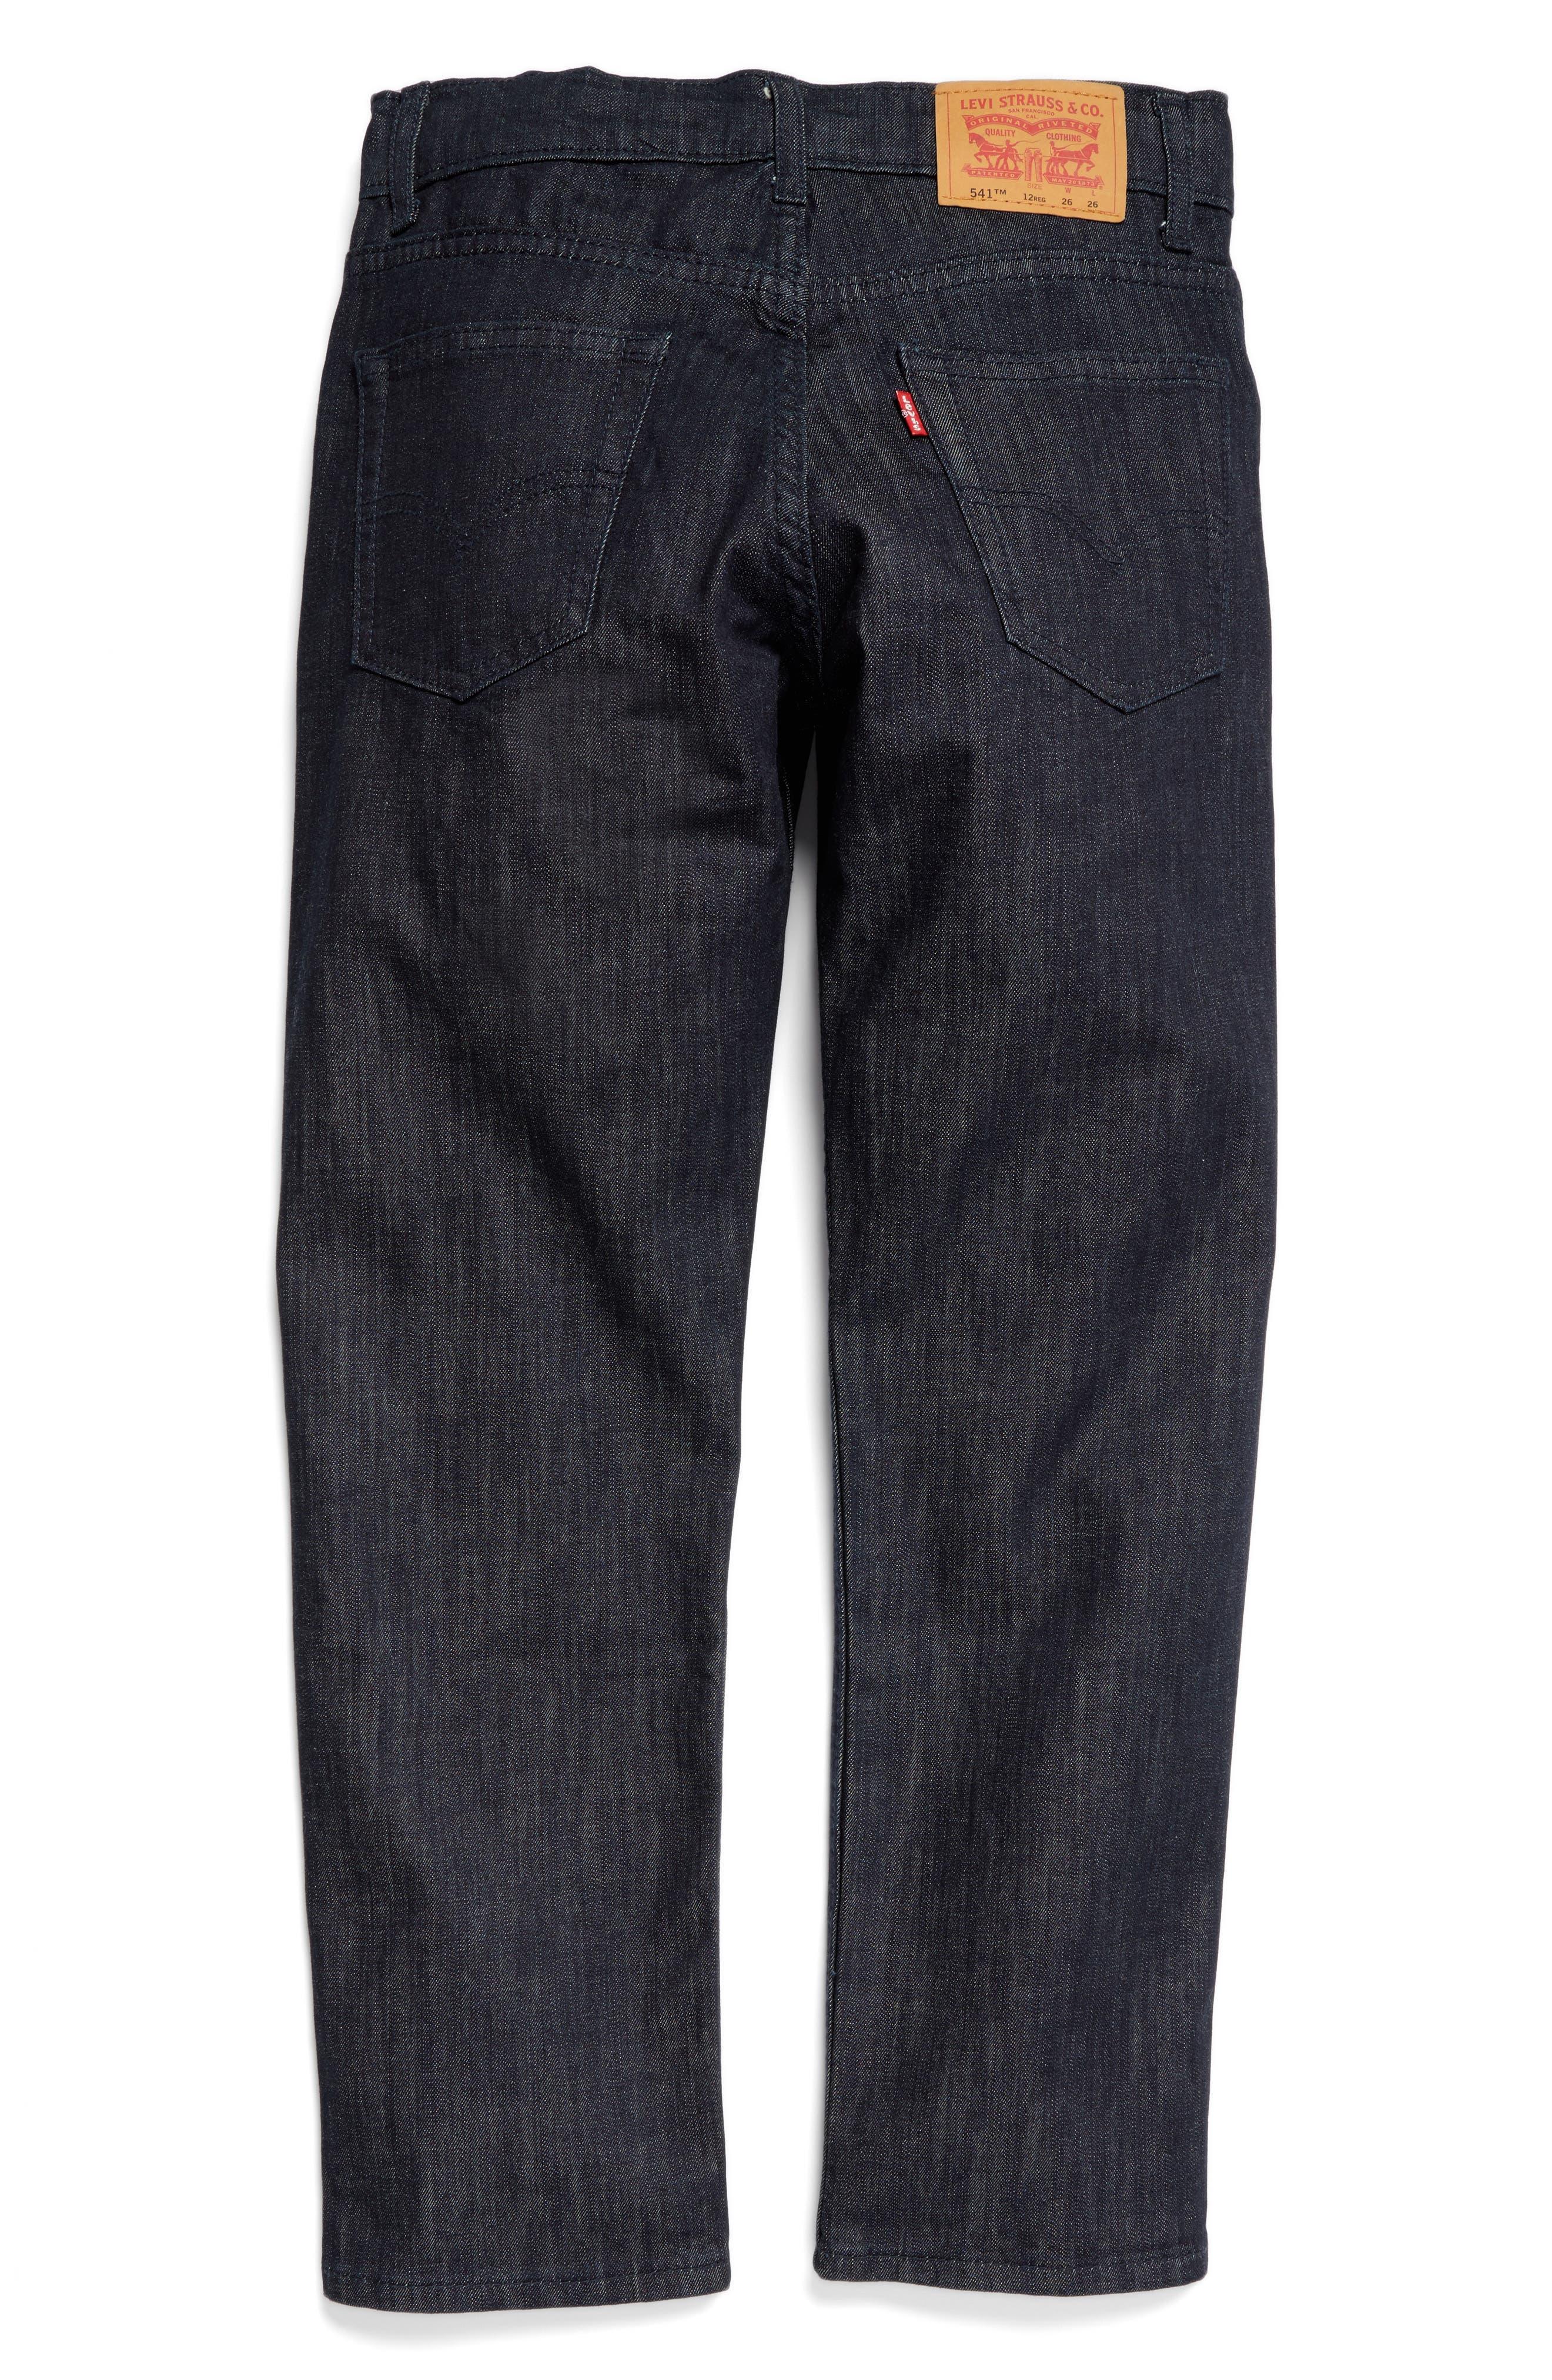 Alternate Image 2  - Levi's® 541™ Athletic Fit Jeans (Big Boys)